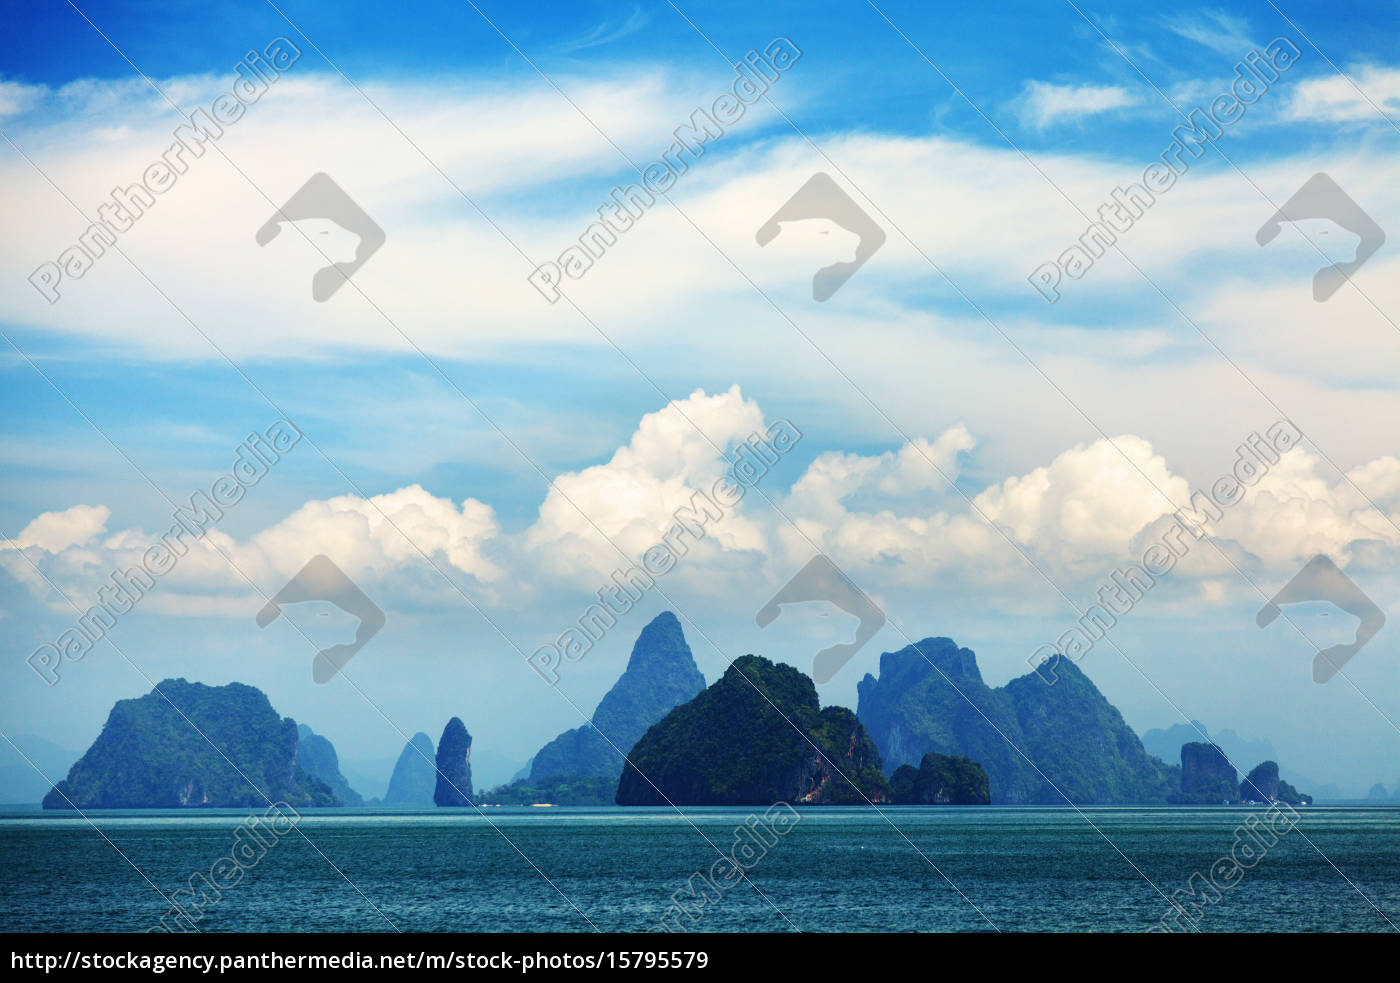 phang, nga, archipelago, near, phuket, , thailand, phang - 15795579